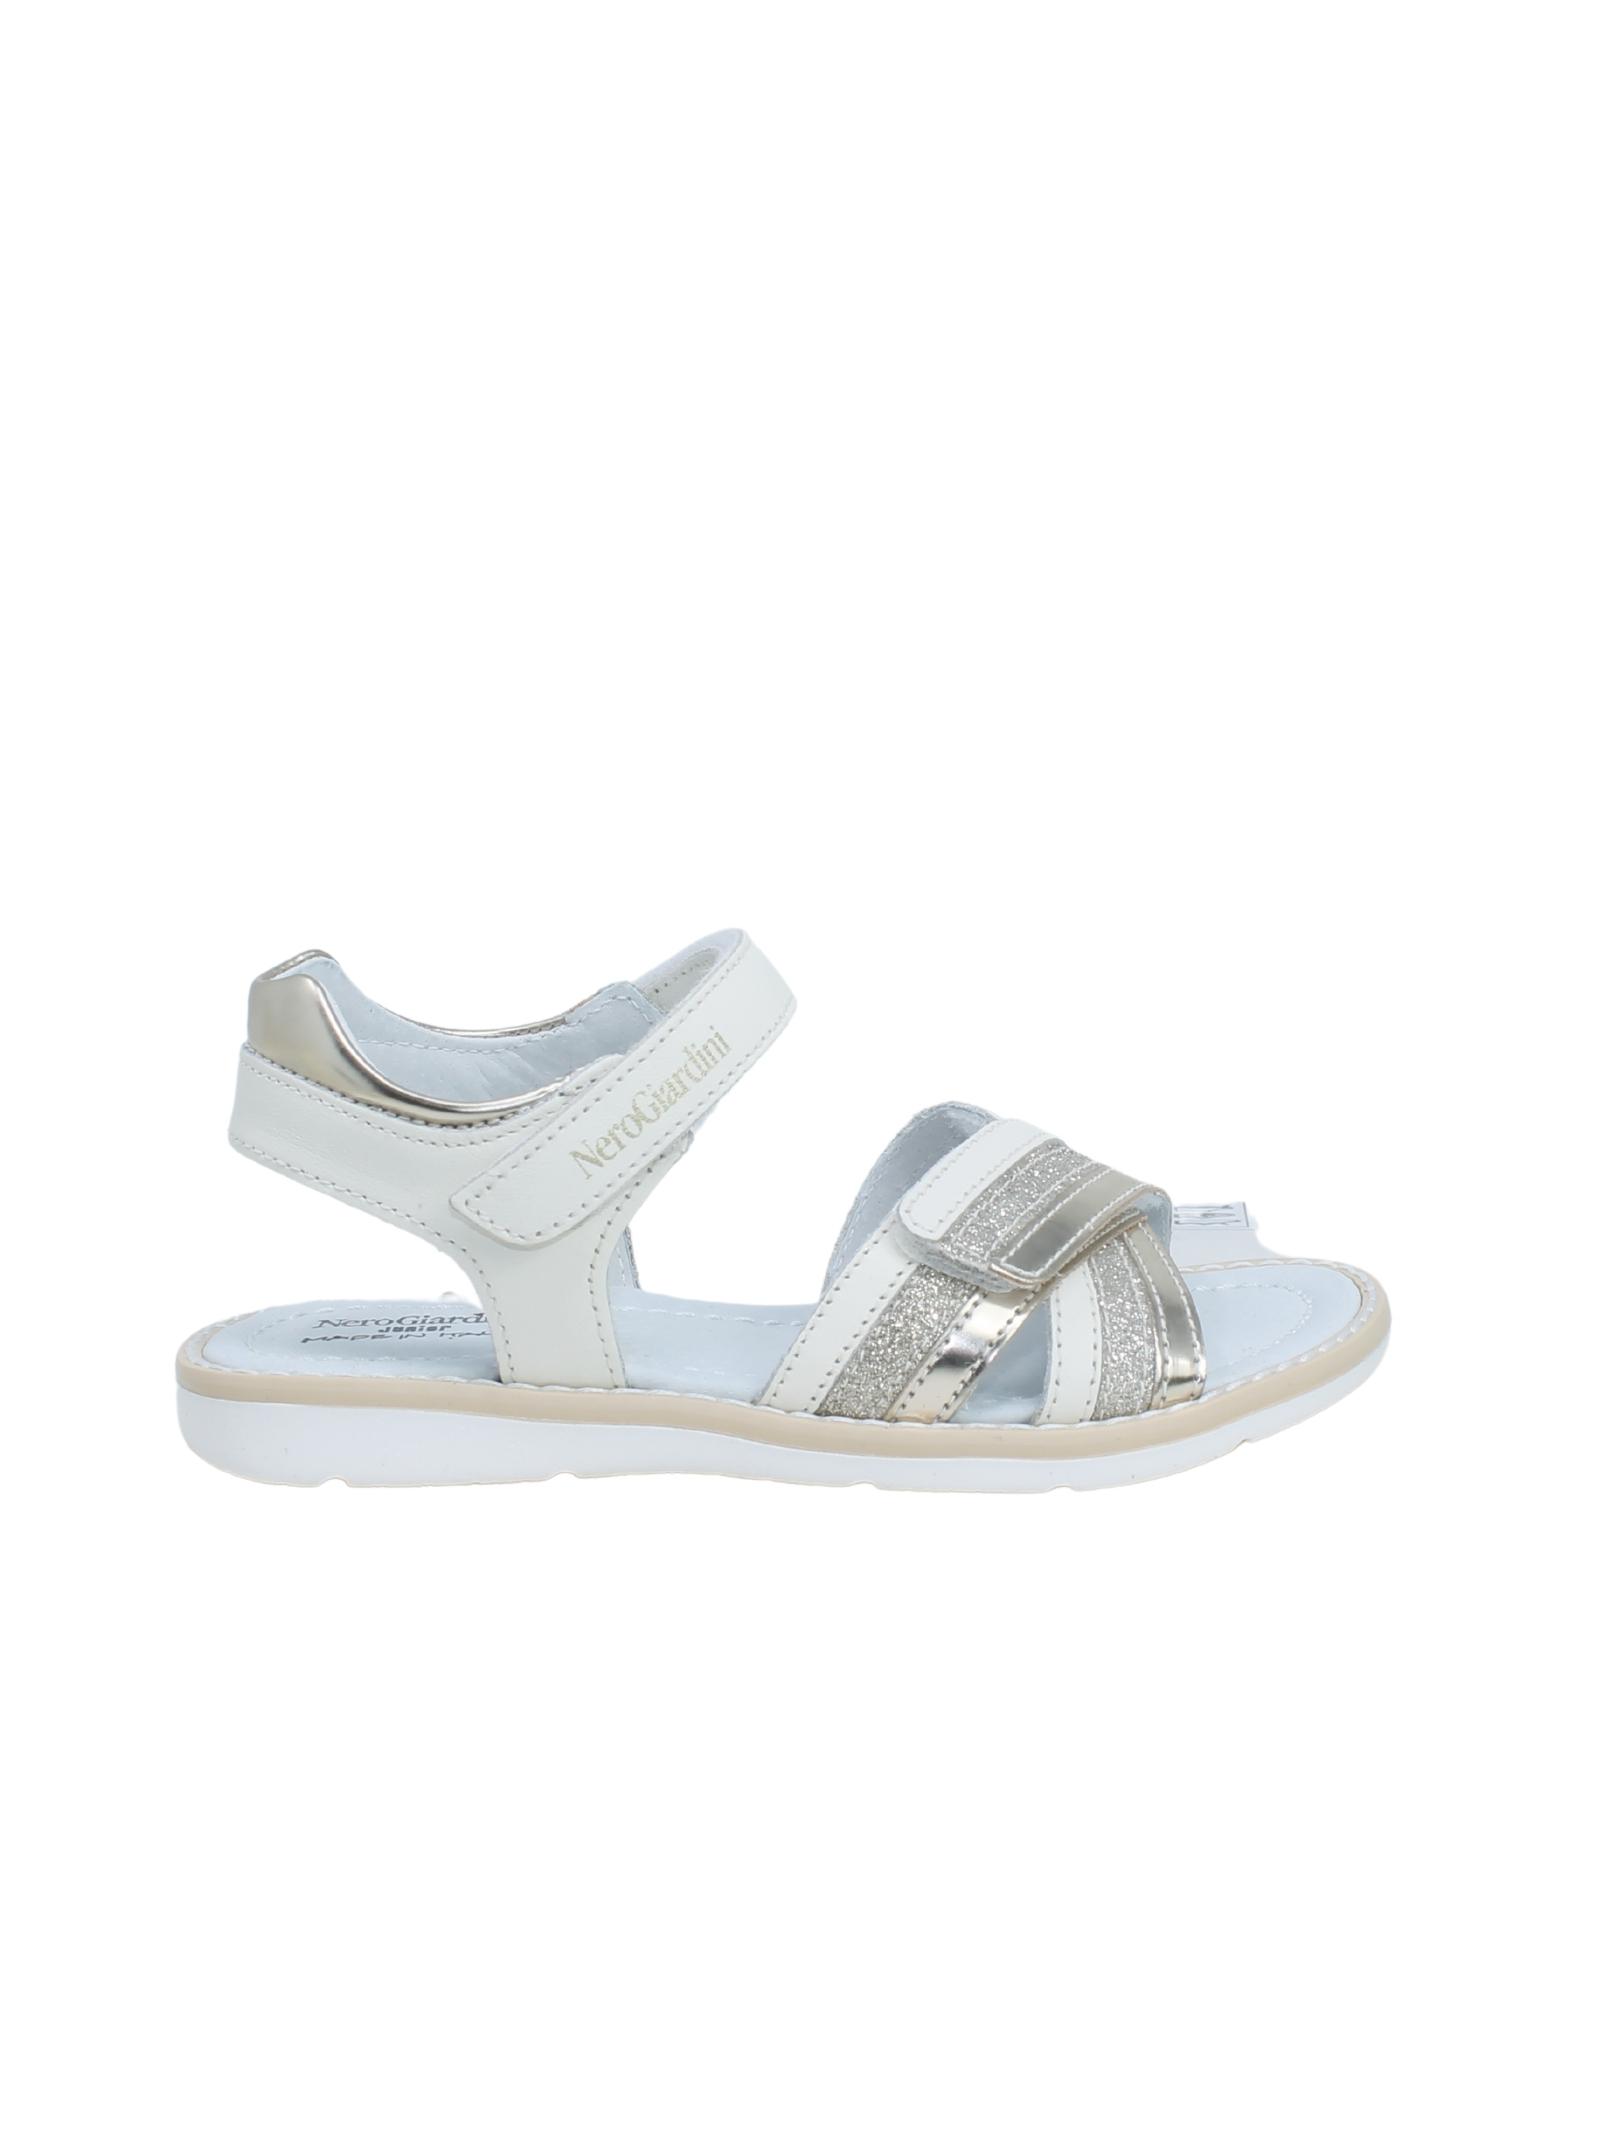 Sandalo Bambina Elegant NERO GIARDINI JUNIOR | Sandali | E128161F711